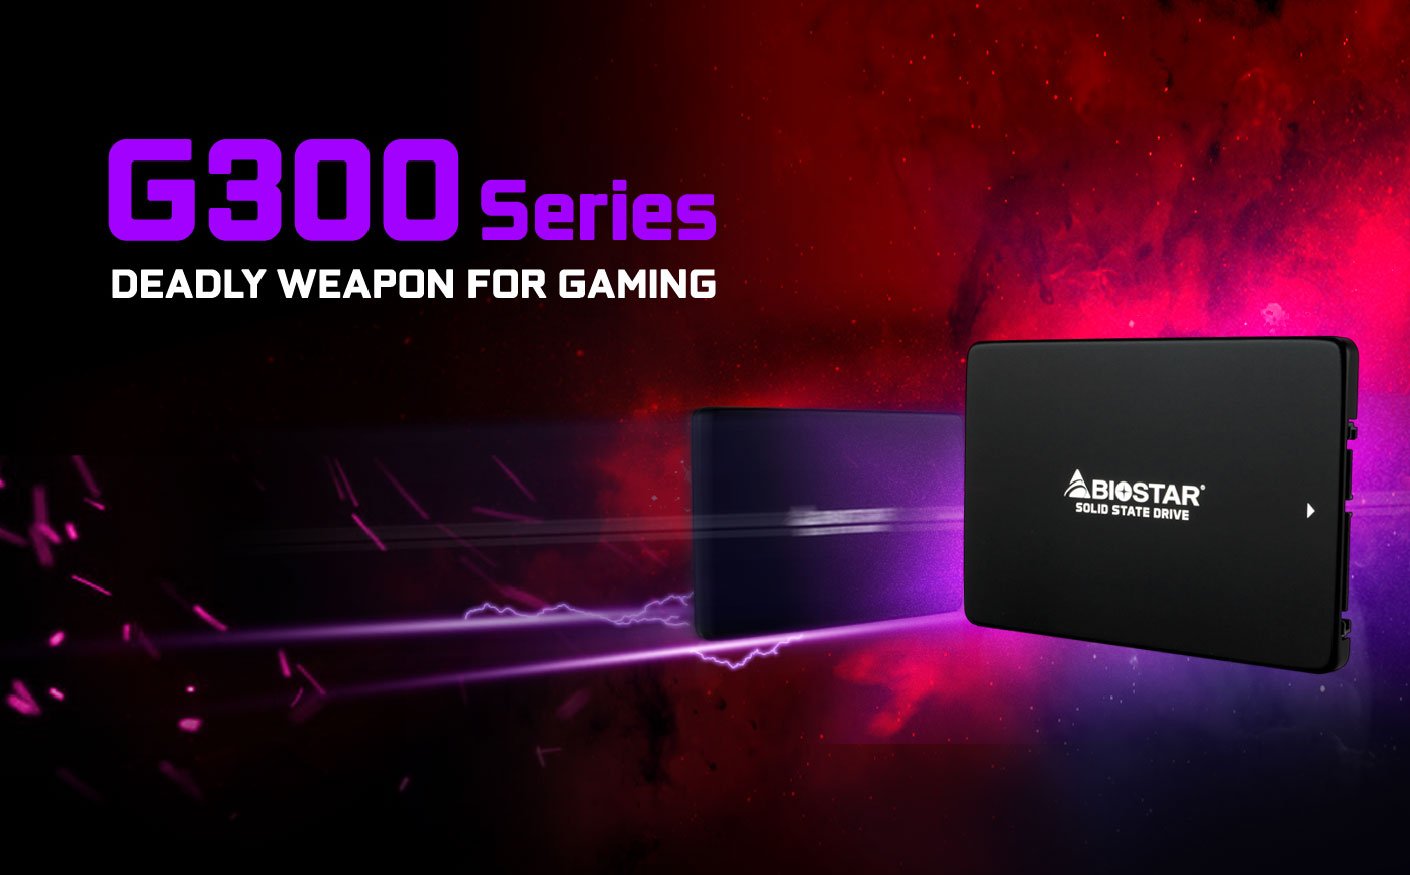 G300 SSD GAMING